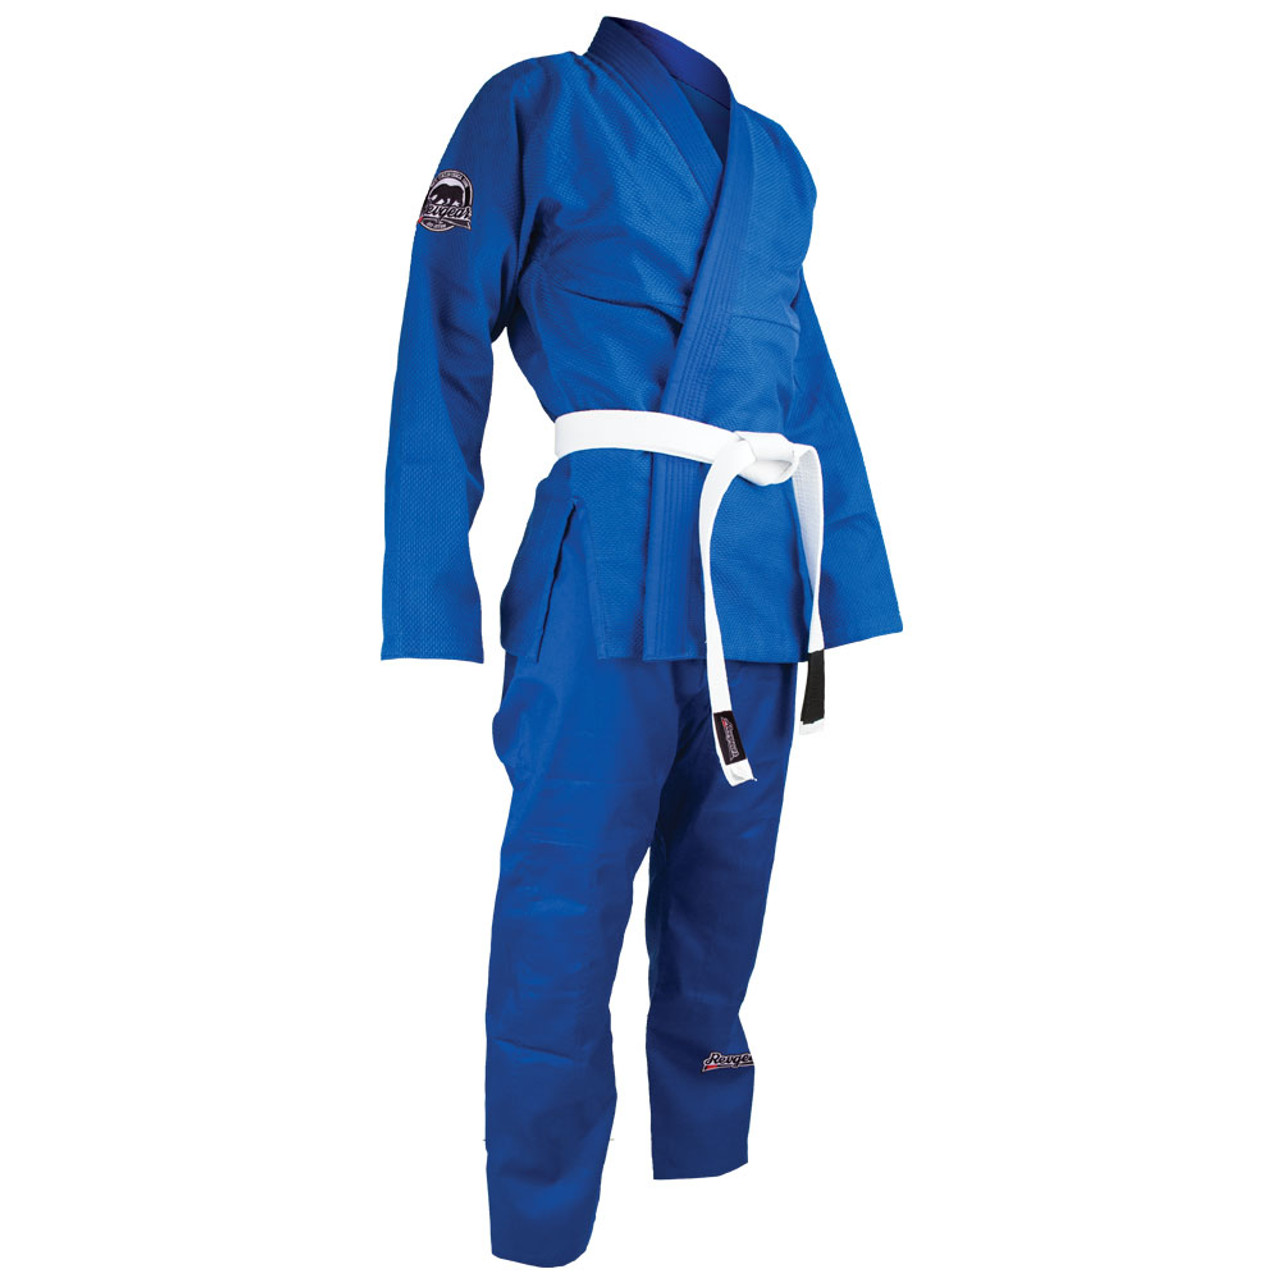 The Ultimate Starter Jiu Jitsu Gi - Blue